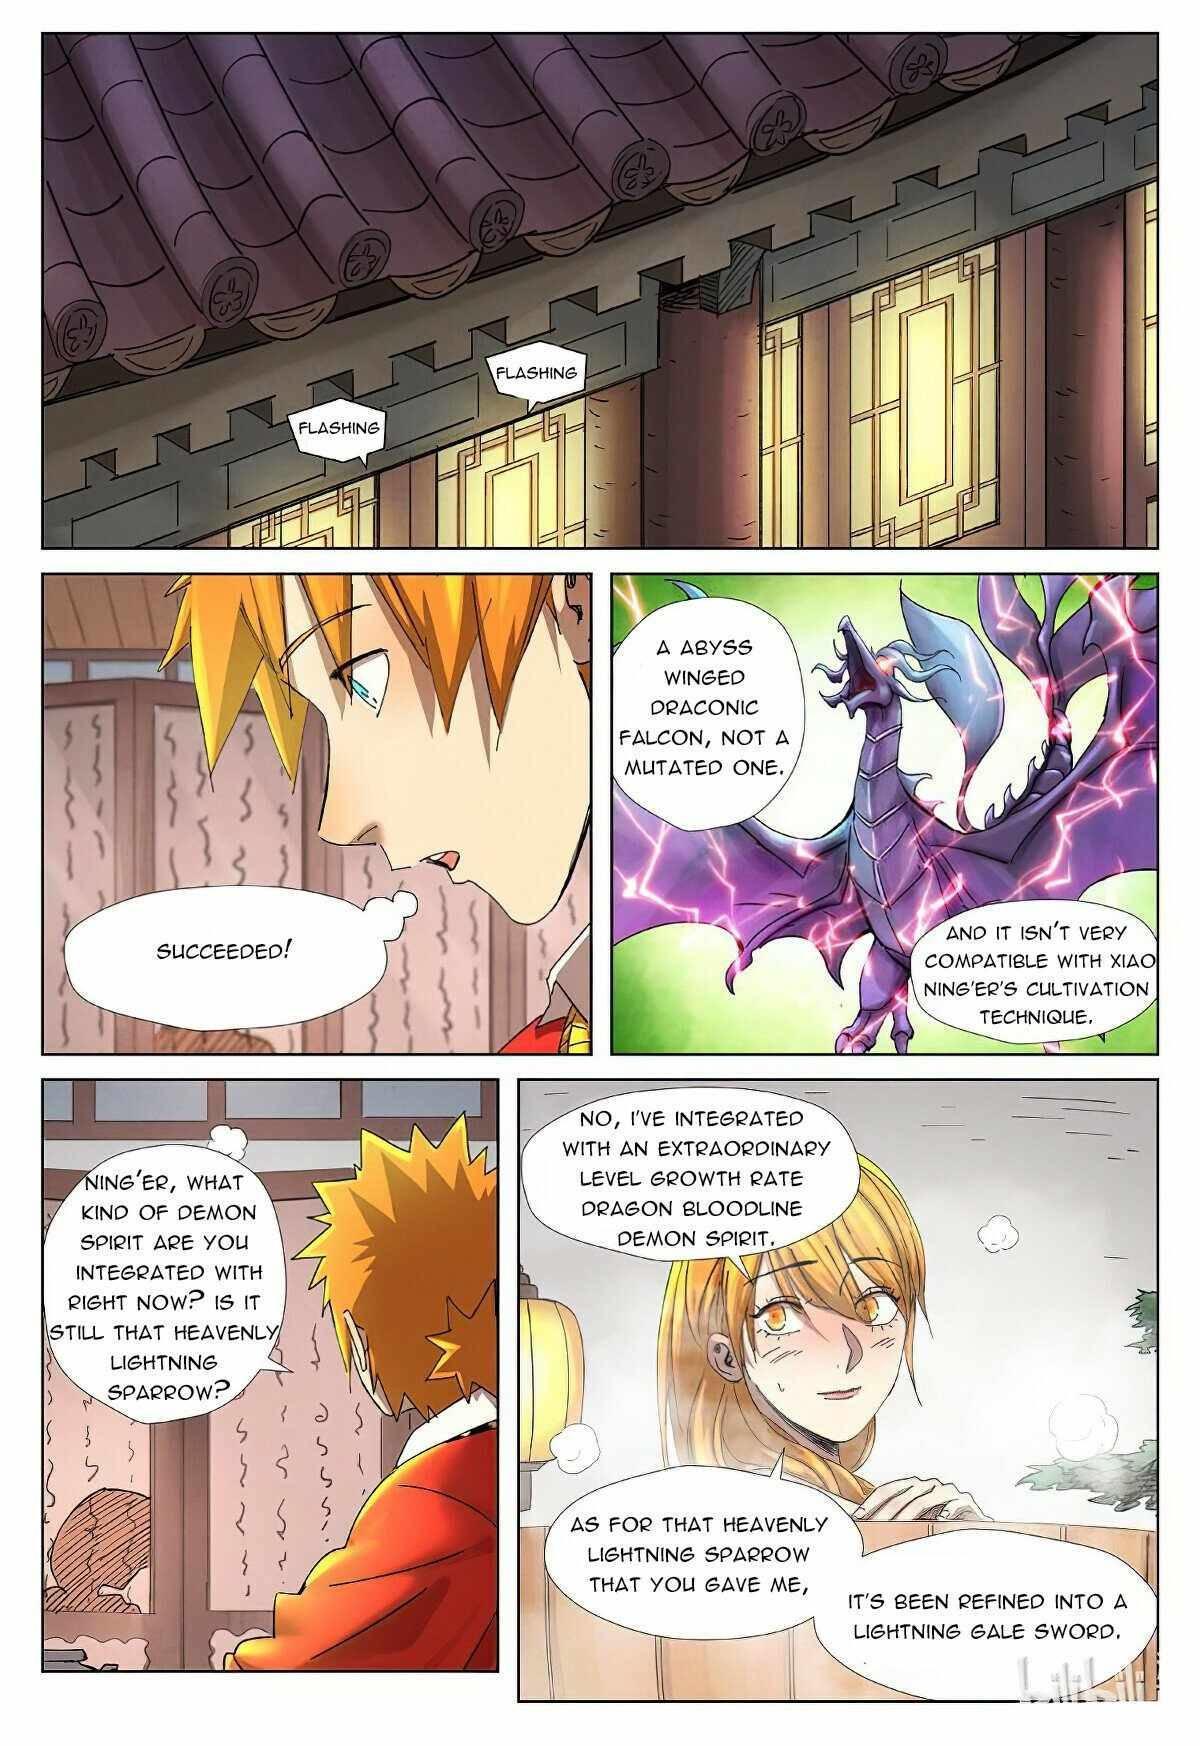 Tales Of Demons And Gods Chapter 343.5 page 7 - Mangakakalot